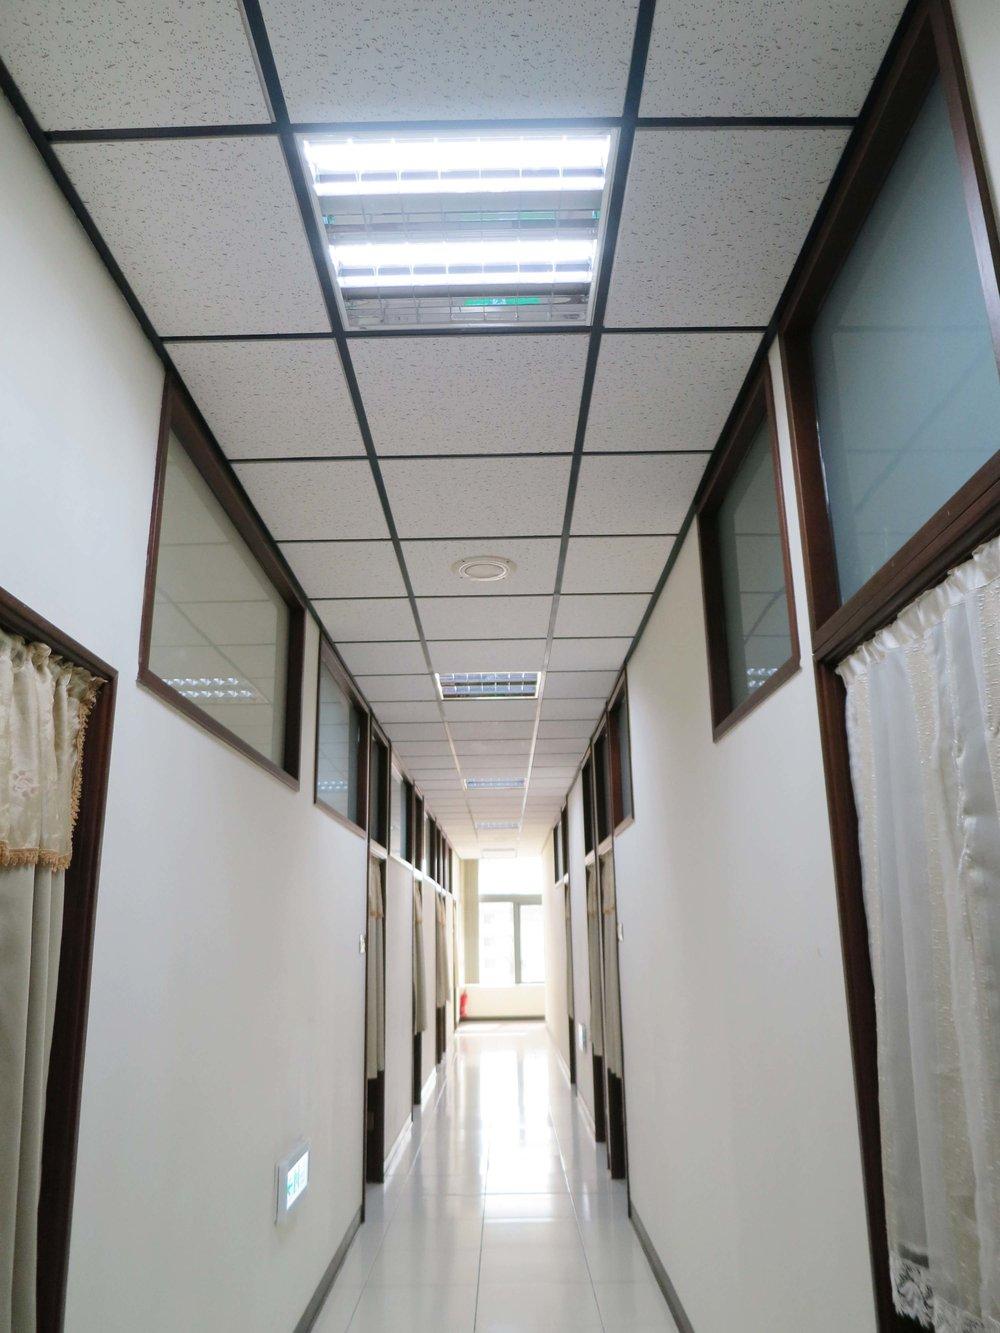 DOMI Blog_客戶故事_元亨寺狹長走廊僅用幾根LED燈管s.jpg